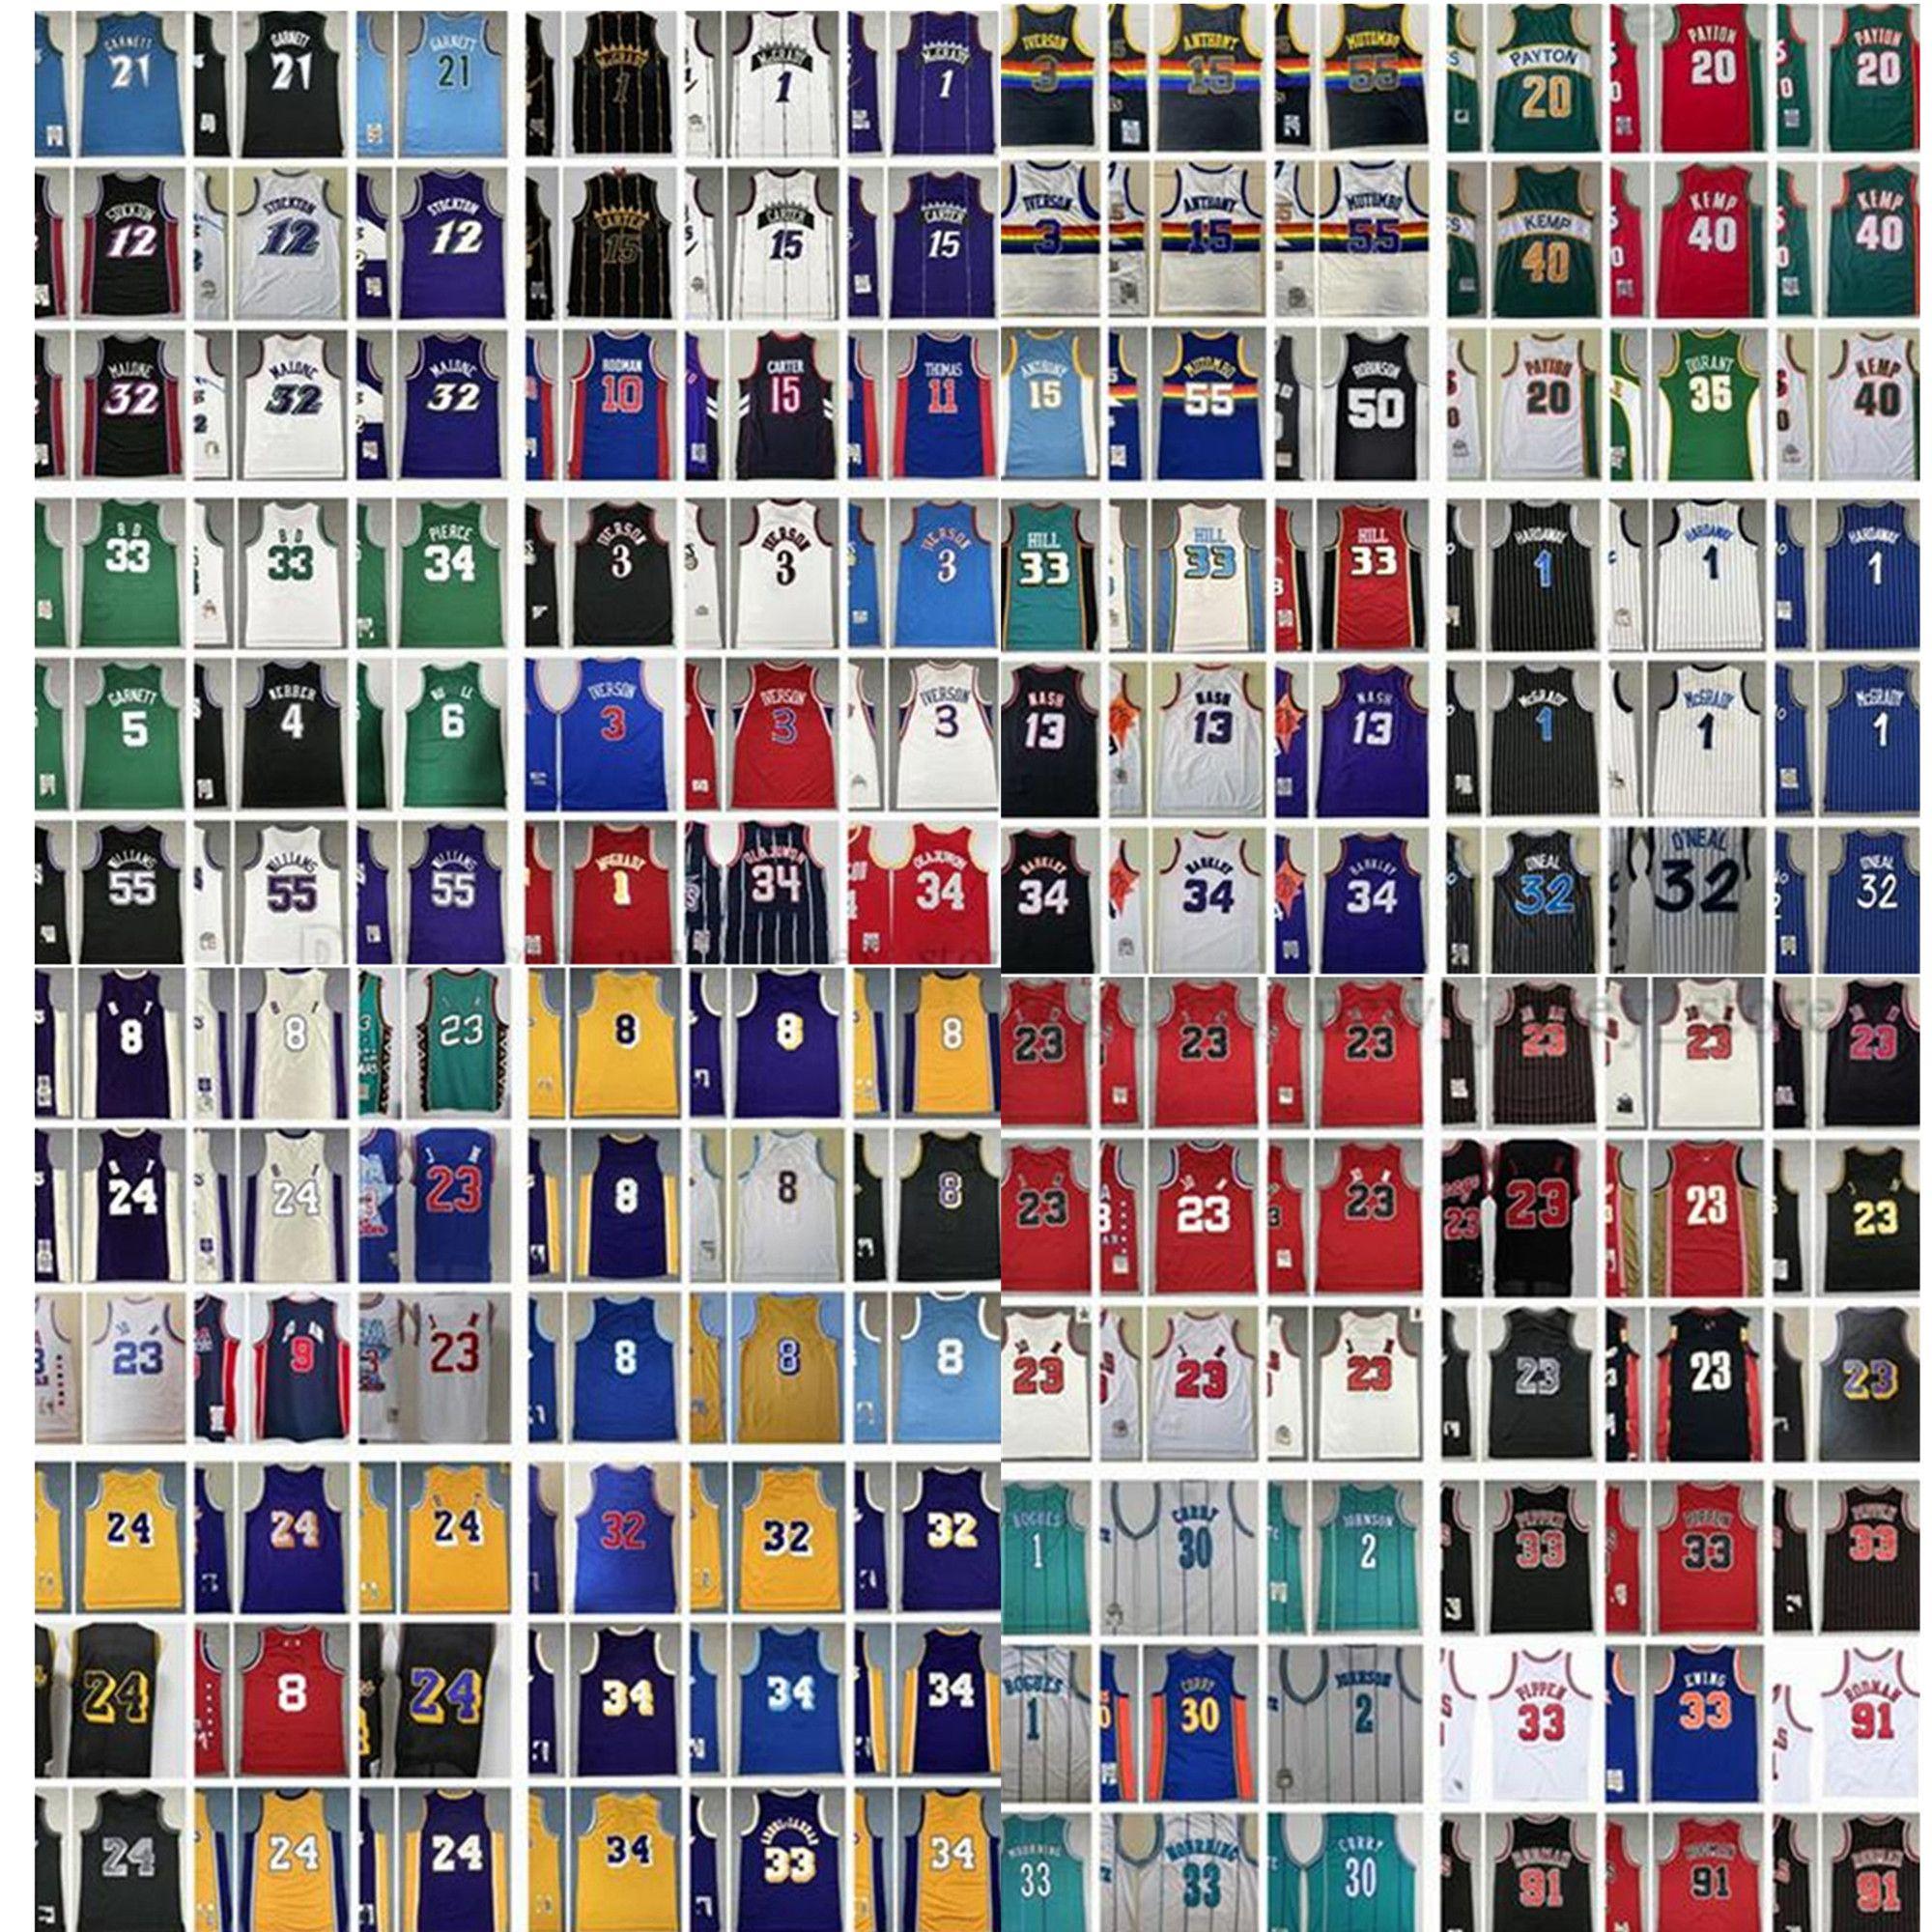 Mitchell et Ness Retro Michael Michael Couts Basketball Jerseys Iverson Pippen Rodman McGrady Garnett Malone Mutombo Bibby Bibby Bikton Kemp Payton Barkley Nash Jersey